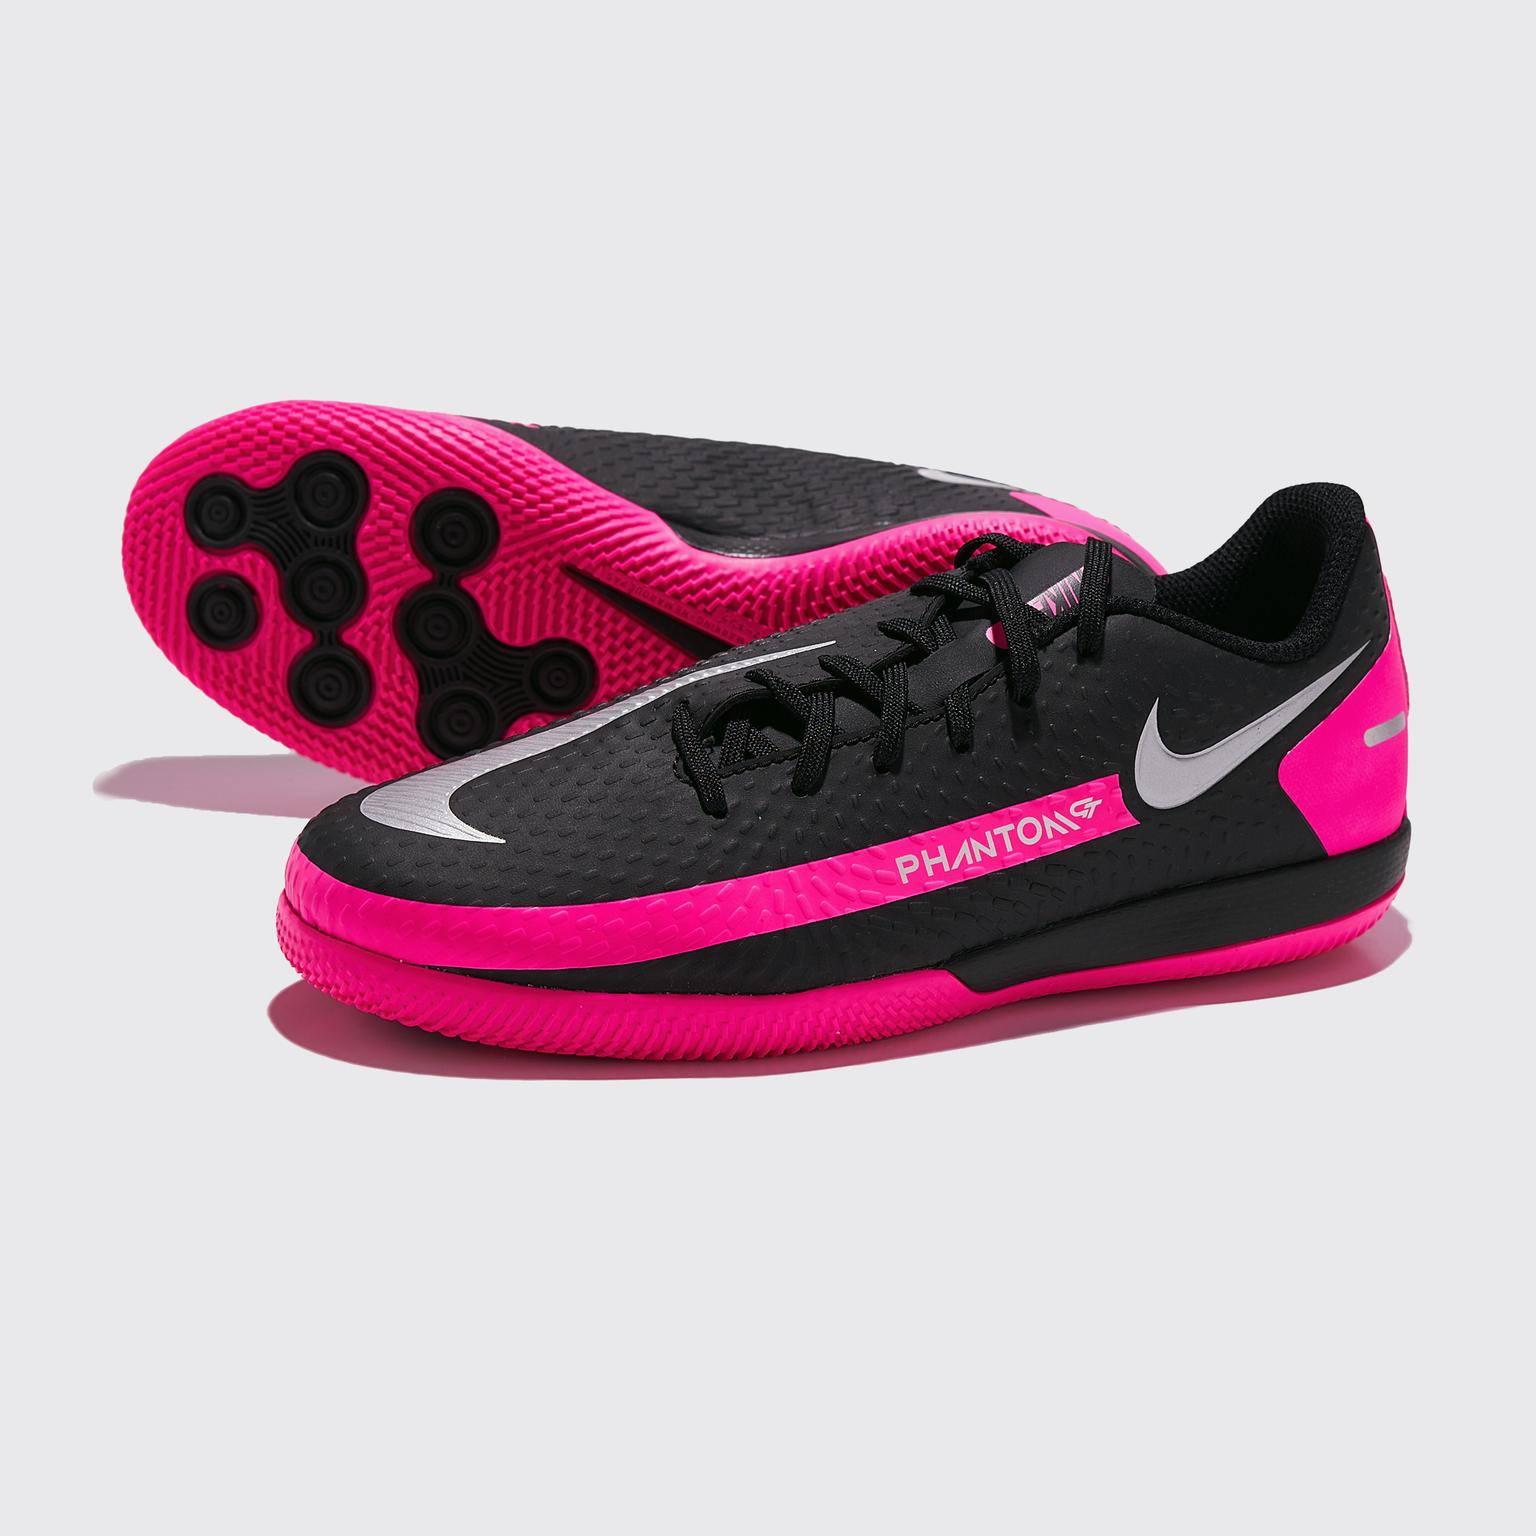 Футзалки детские Nike Phantom GT Academy IC CK8480-006 футзалки детские nike legend 8 academy ic at5735 606